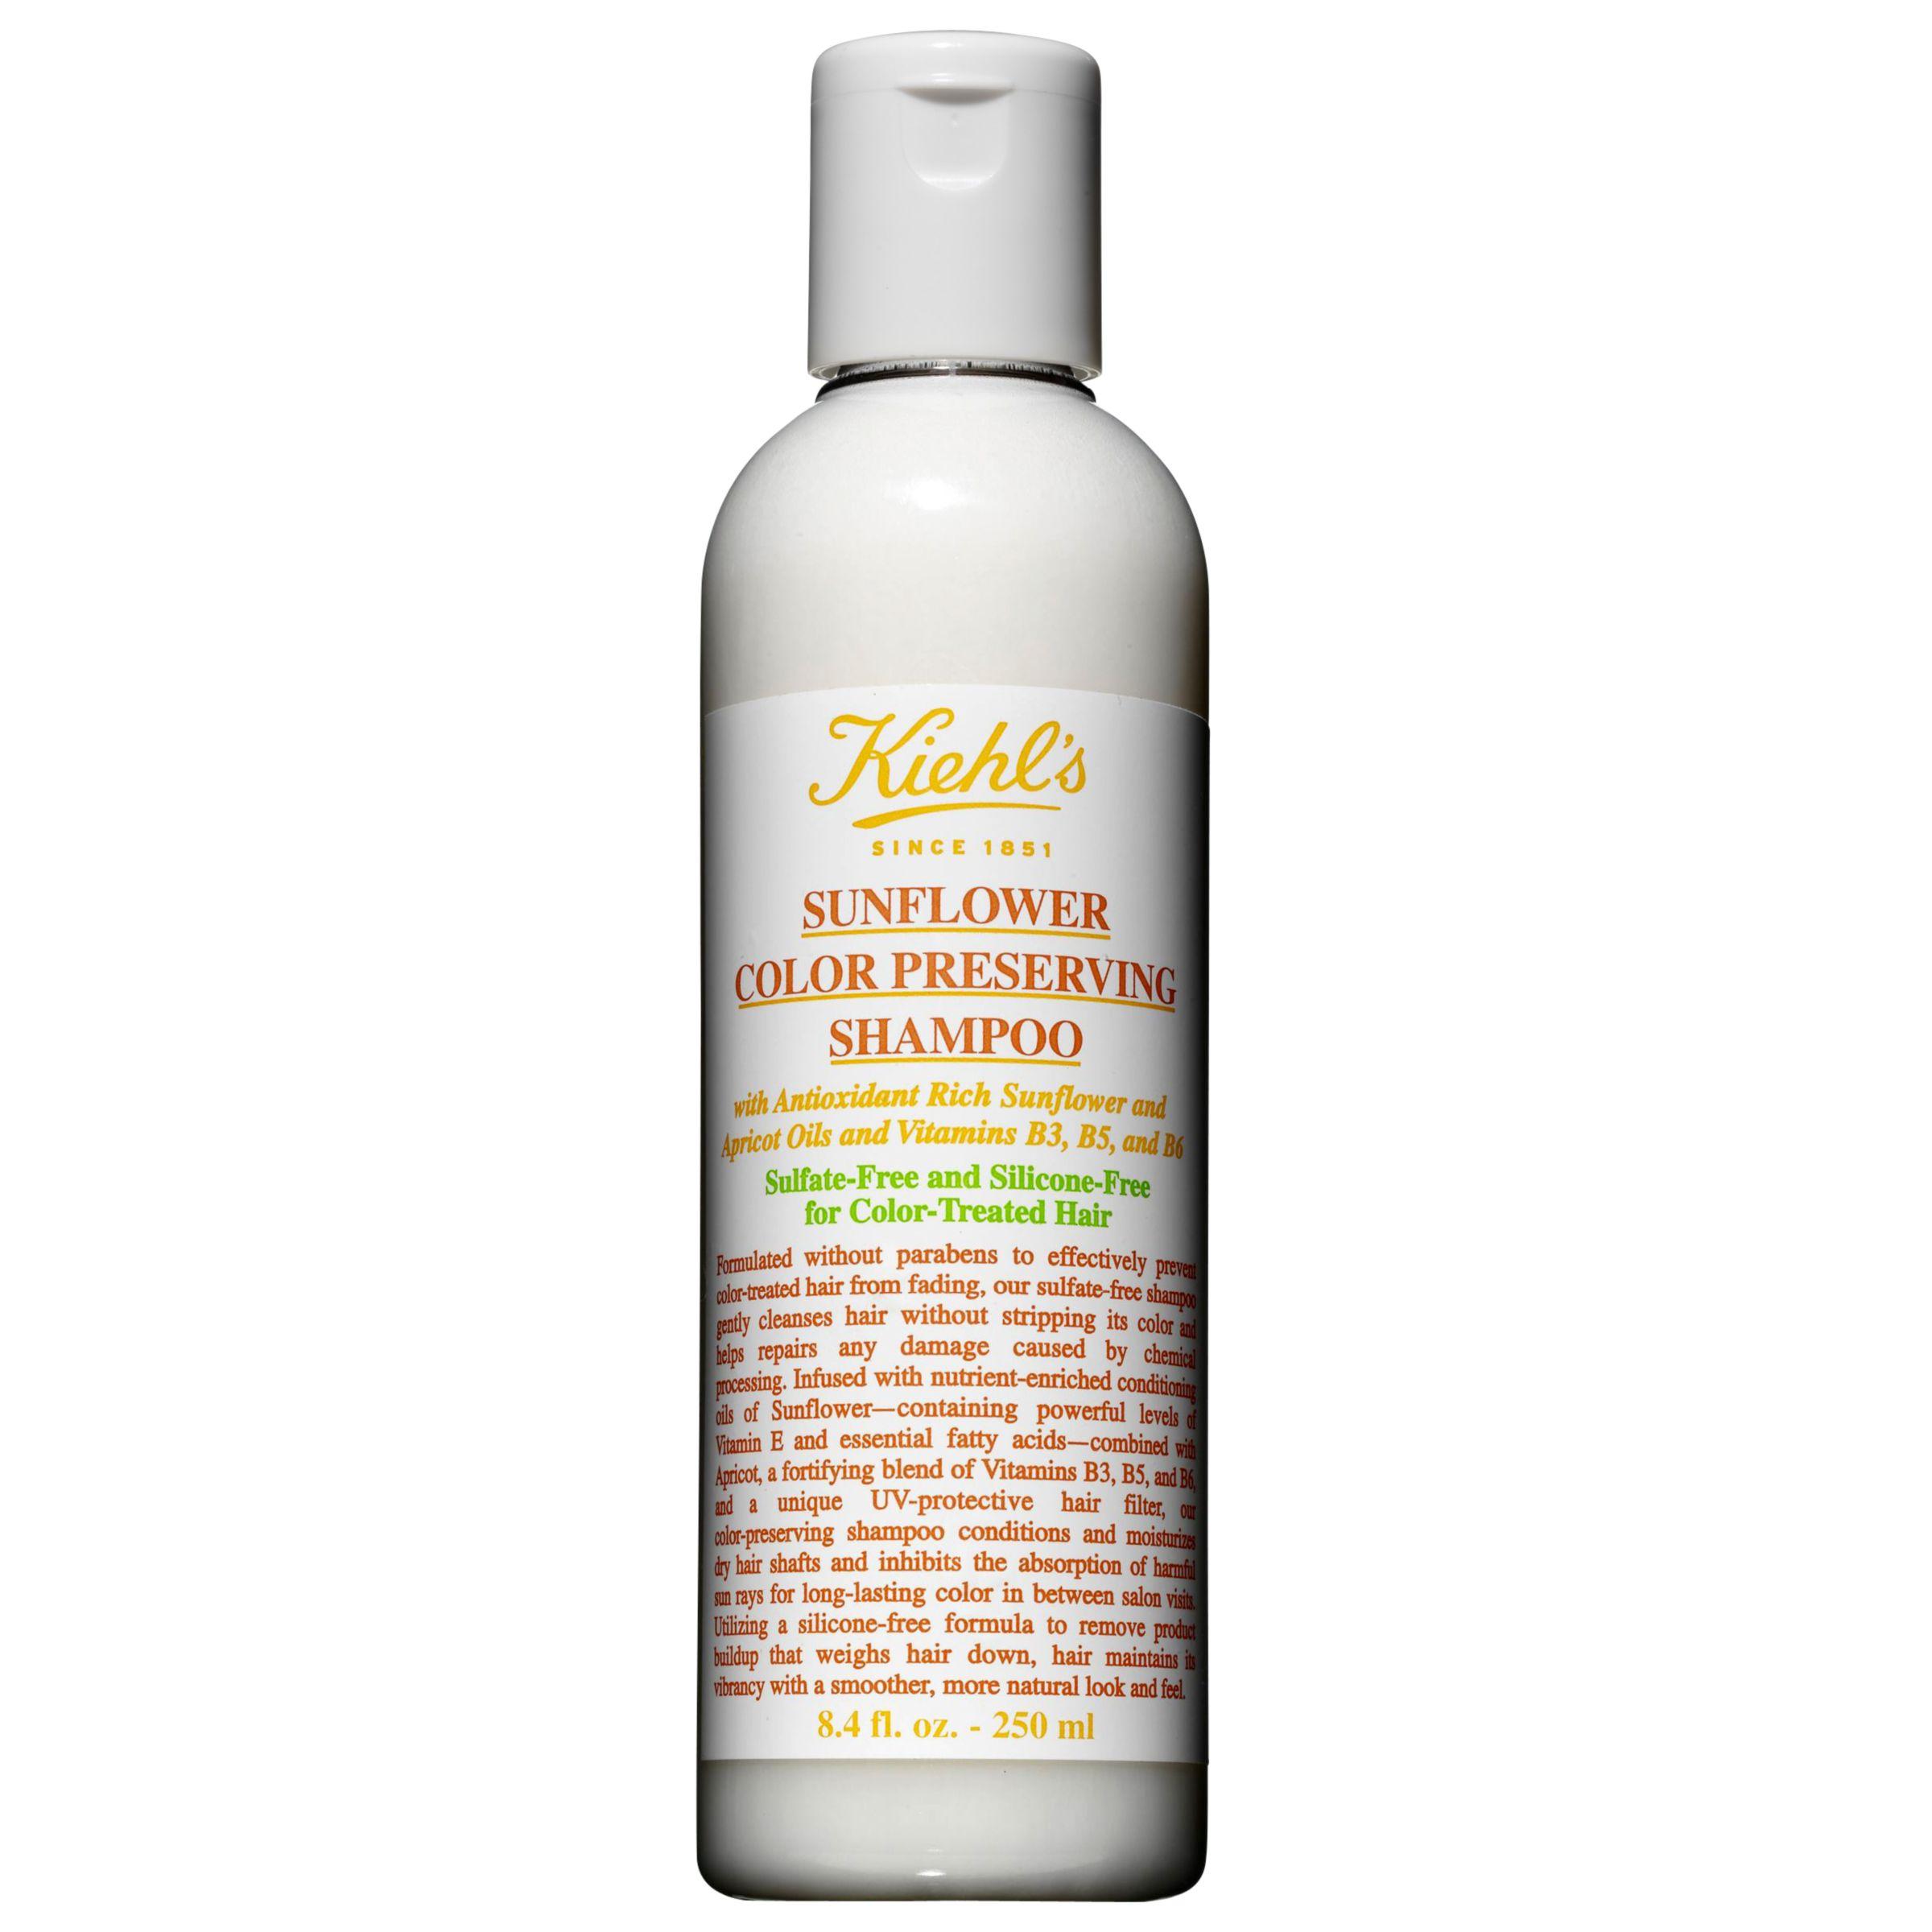 Kiehls Kiehl's Sunflower Color Preserving Shampoo, 250ml